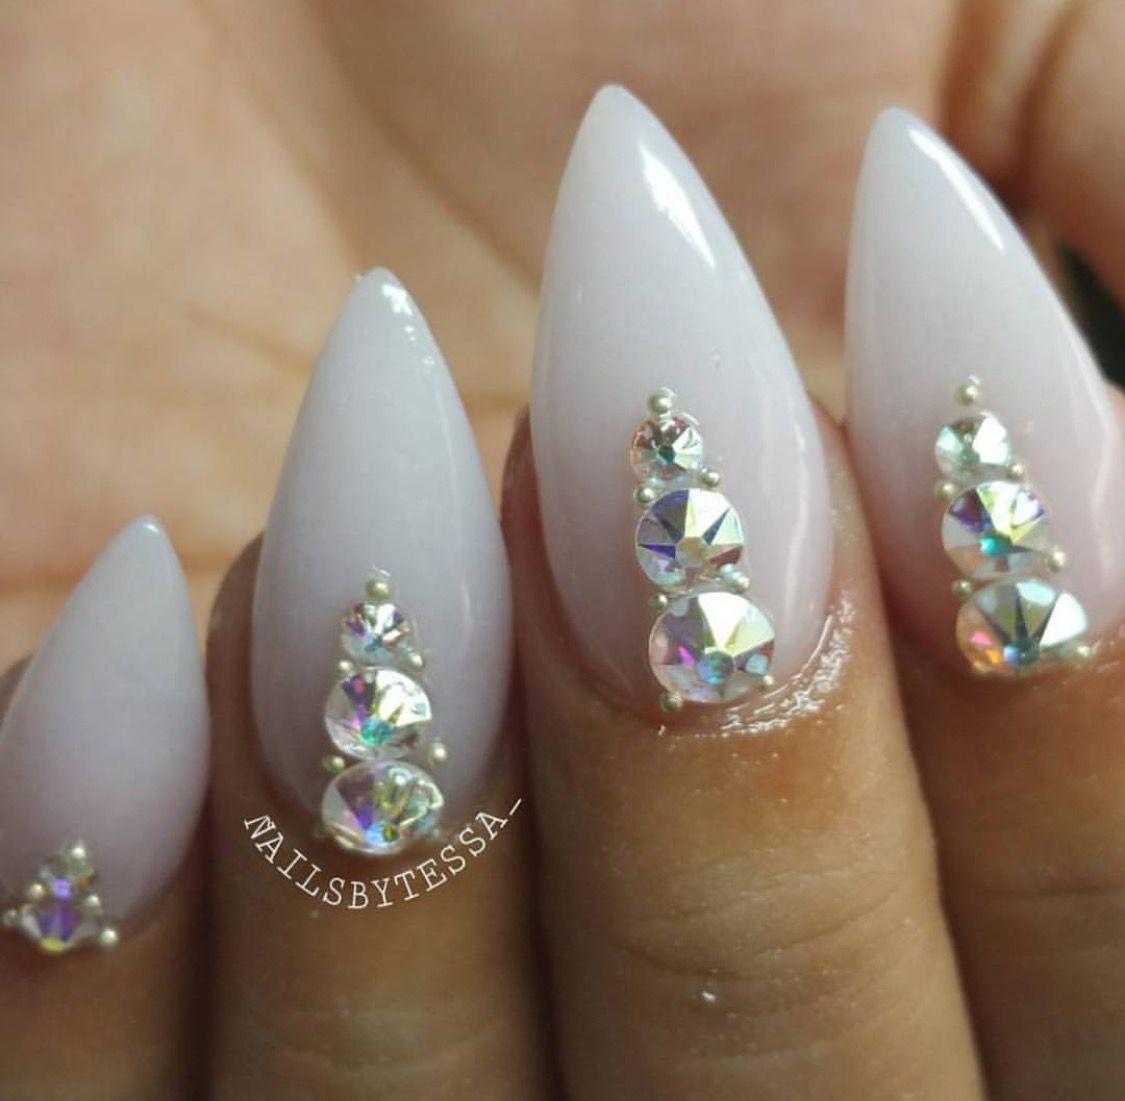 Pin de BeLLa HoNeY Luvz MoneY en Fierce Nails | Pinterest | Diseños ...